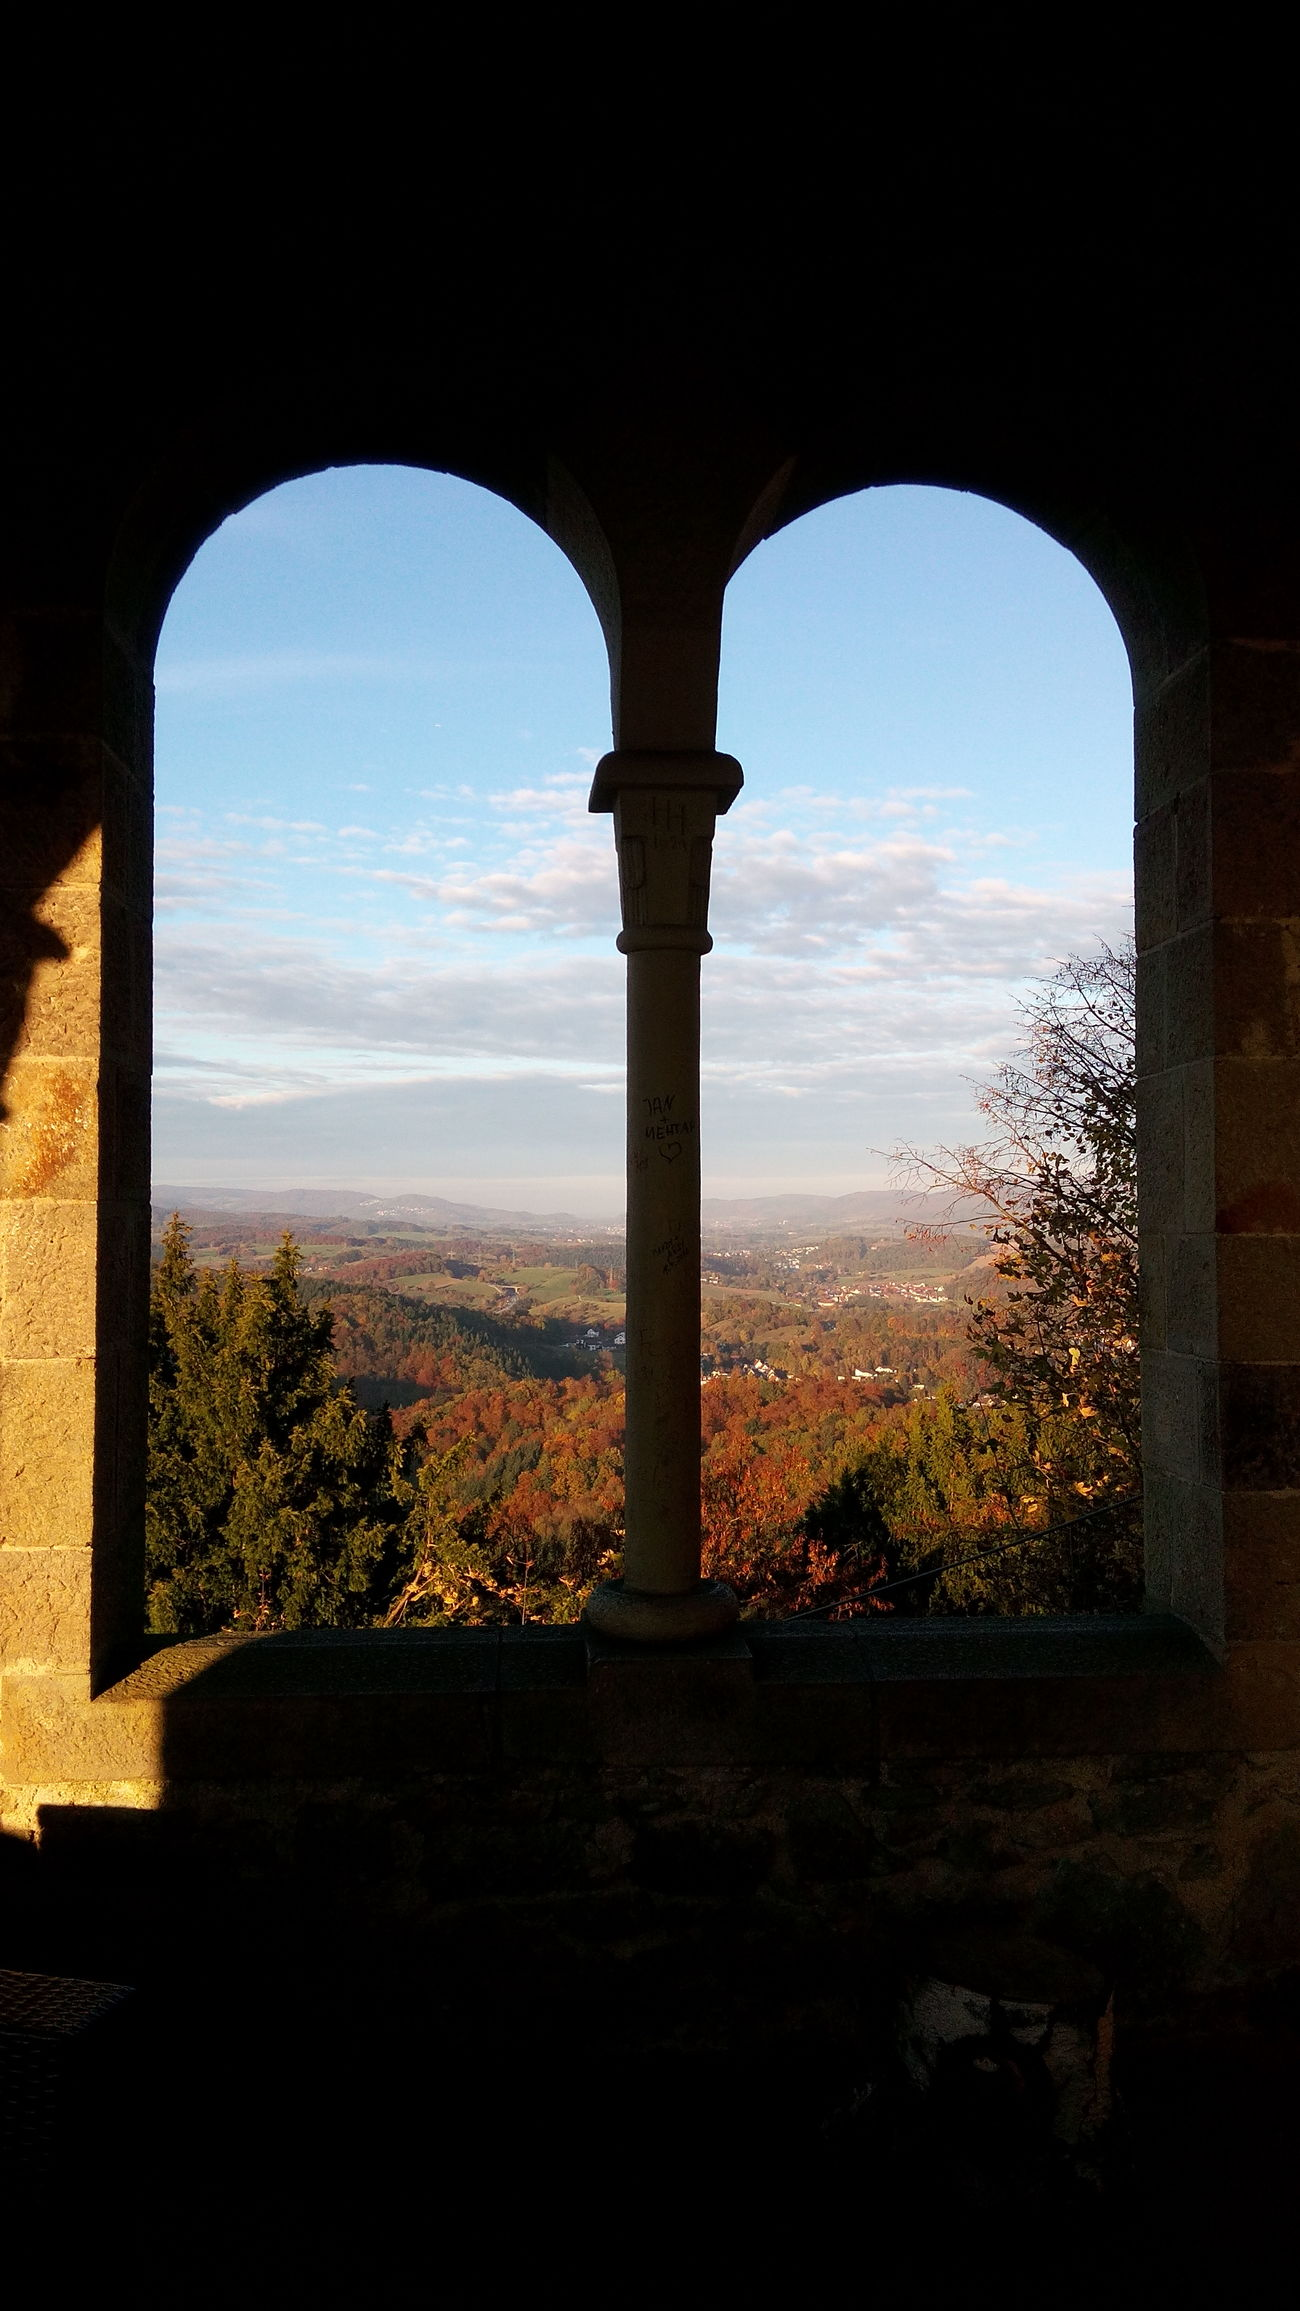 Weinheim Autumn🍁🍁🍁 Autumn Autumn Colors Summerlight Mountain Castle View From Above Landscape Nature